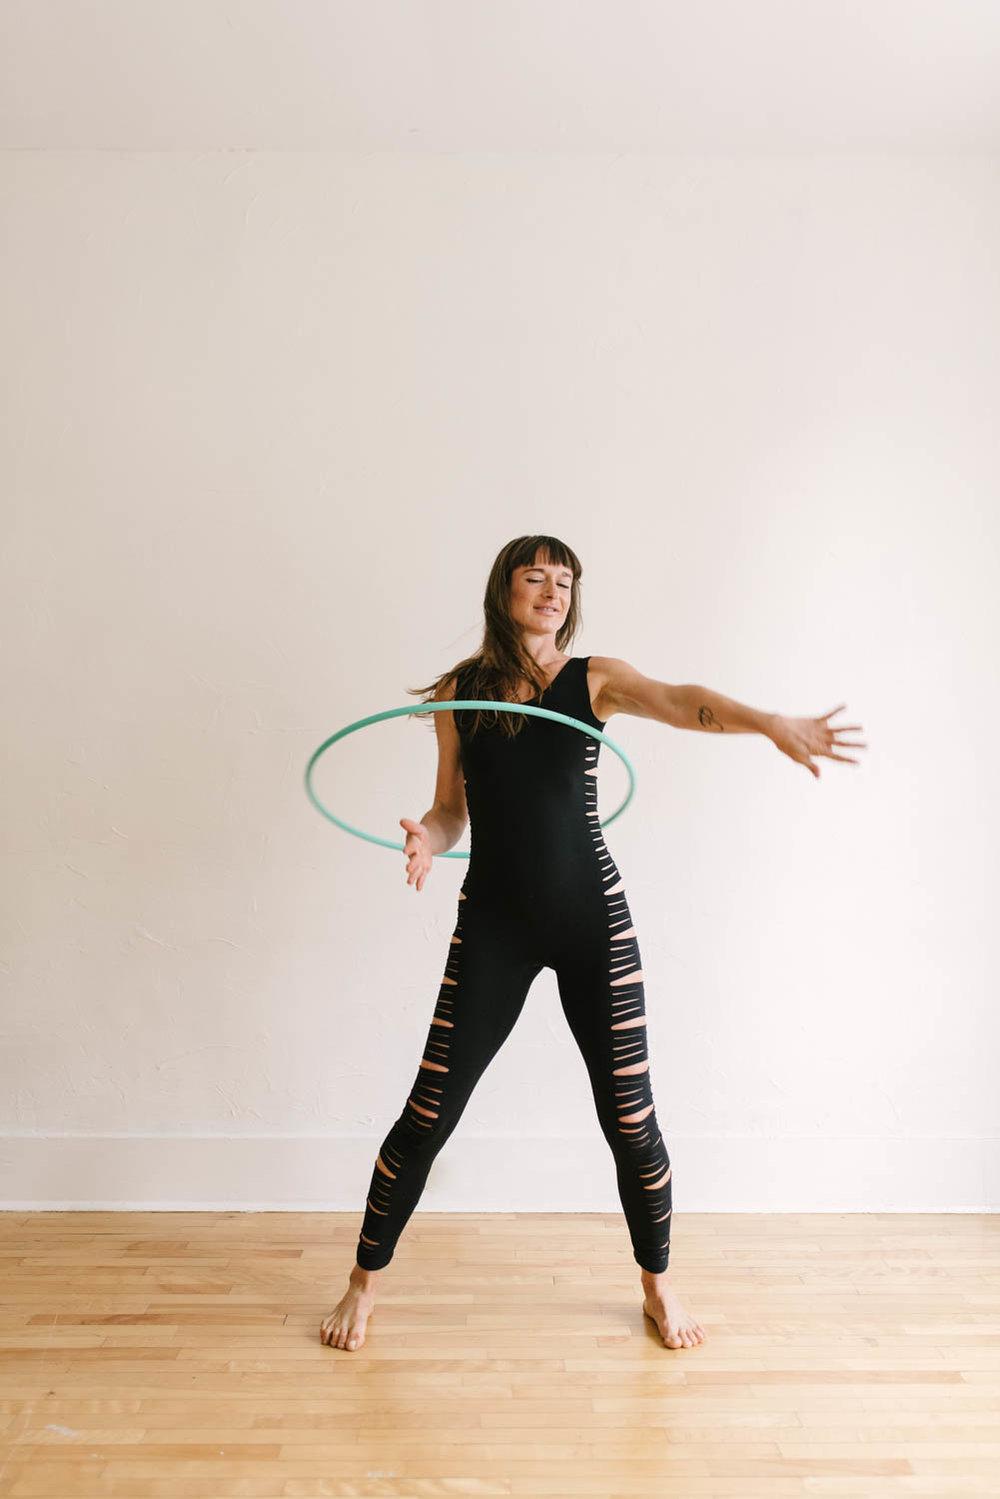 woman-with-hula-hoop-color-2-©Copyright-Elisabeth-Waller.jpg